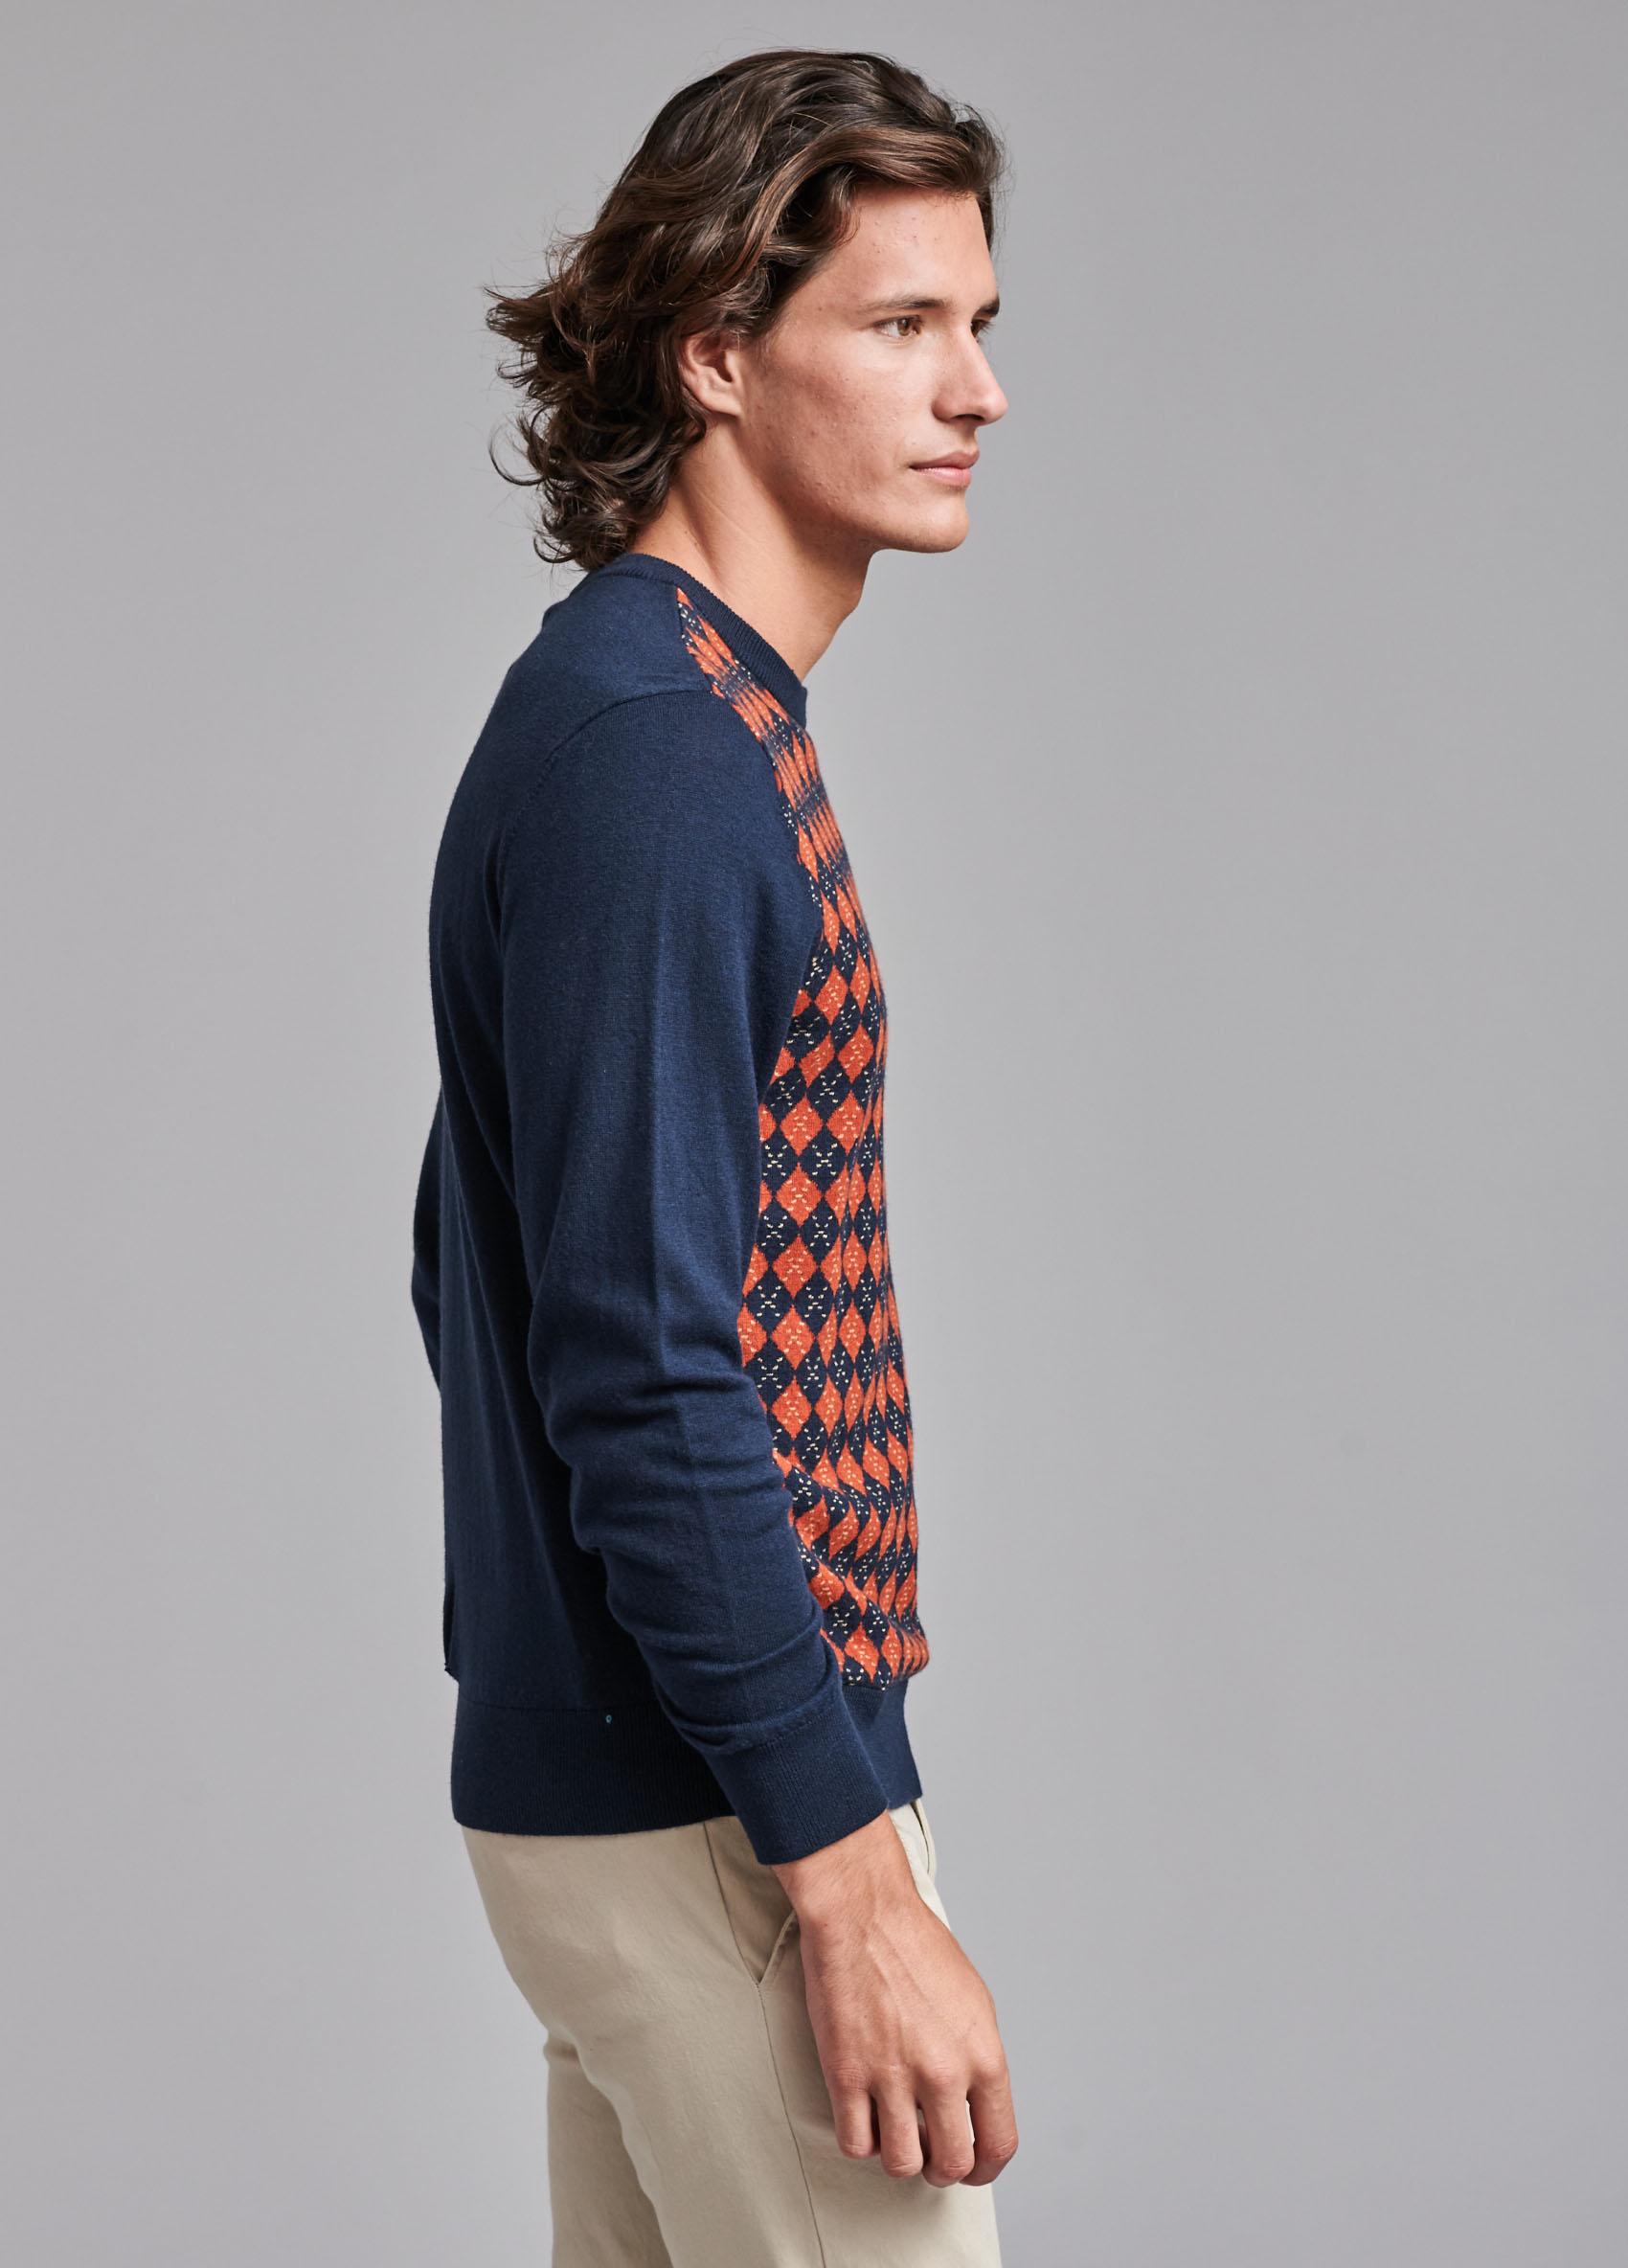 penguin_argyle-jacquard-front-sweater_15-06-2019__picture-9192